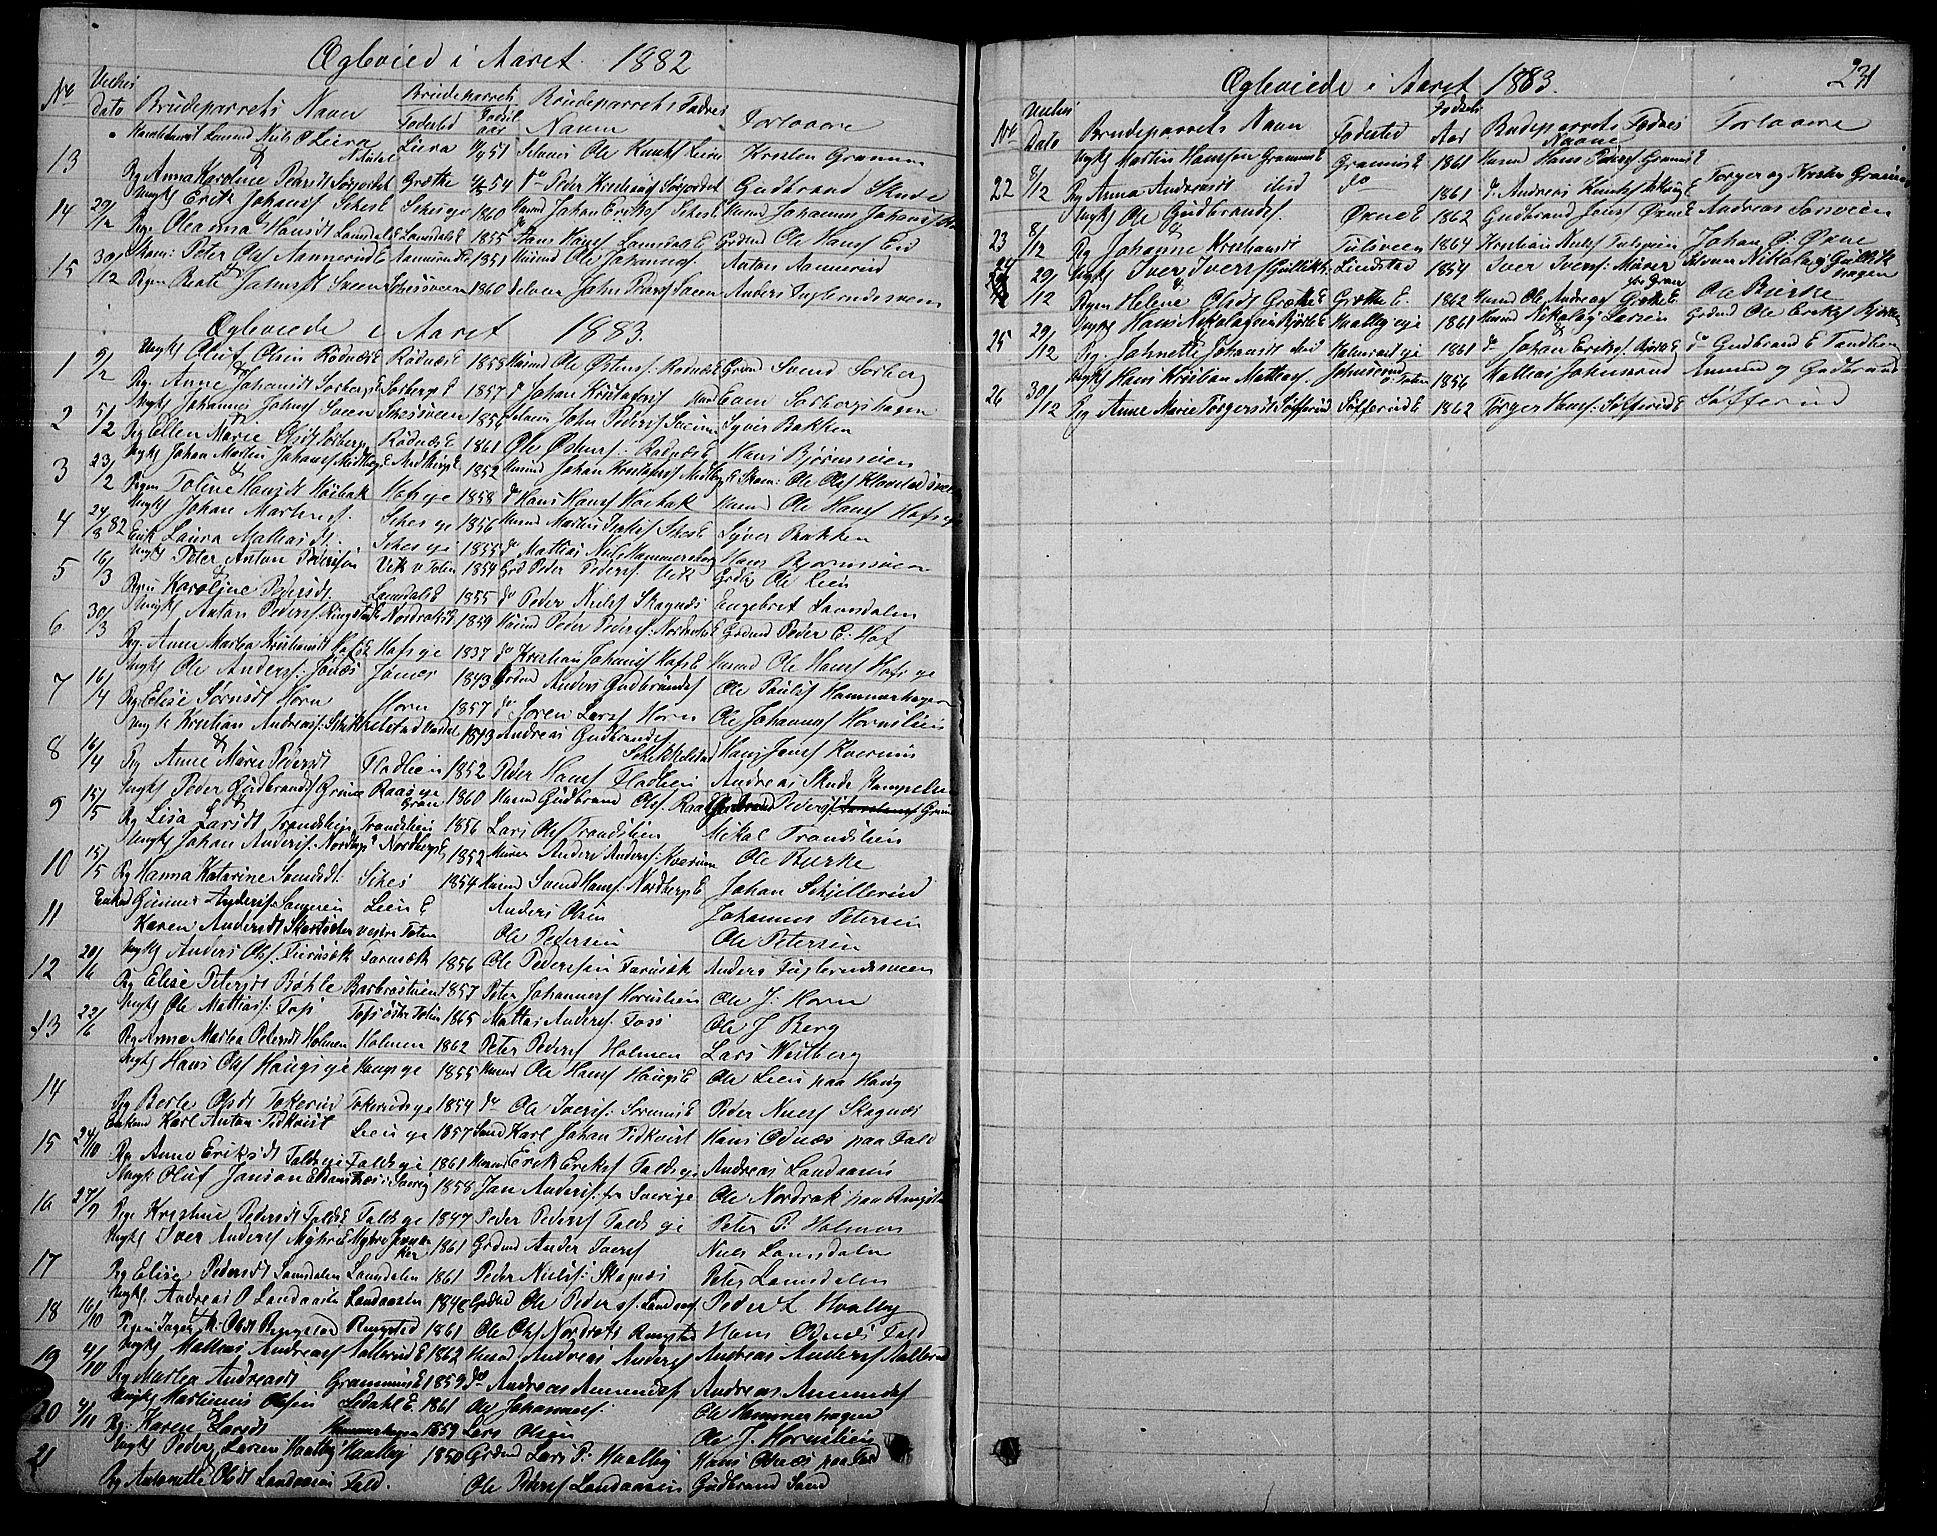 SAH, Søndre Land prestekontor, L/L0001: Klokkerbok nr. 1, 1849-1883, s. 231